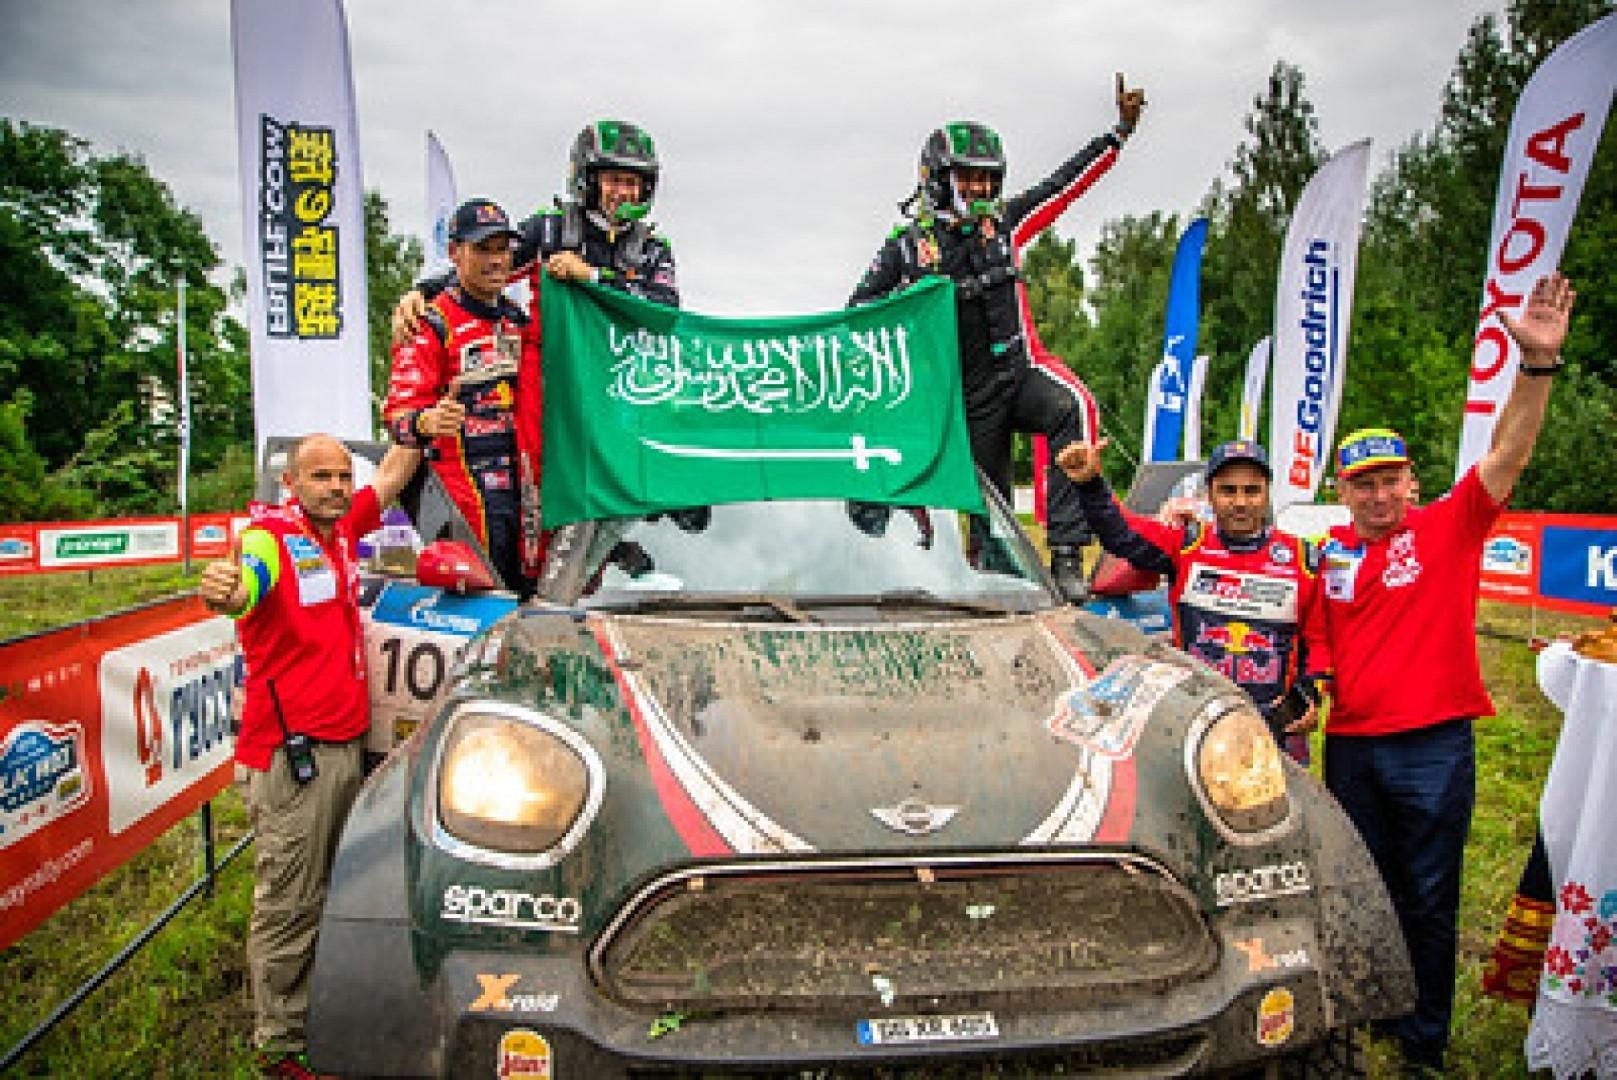 Silkway 2018 : Al Rajhi vainqueur, Al Attiyah malchanceux, Serradori résiste !!